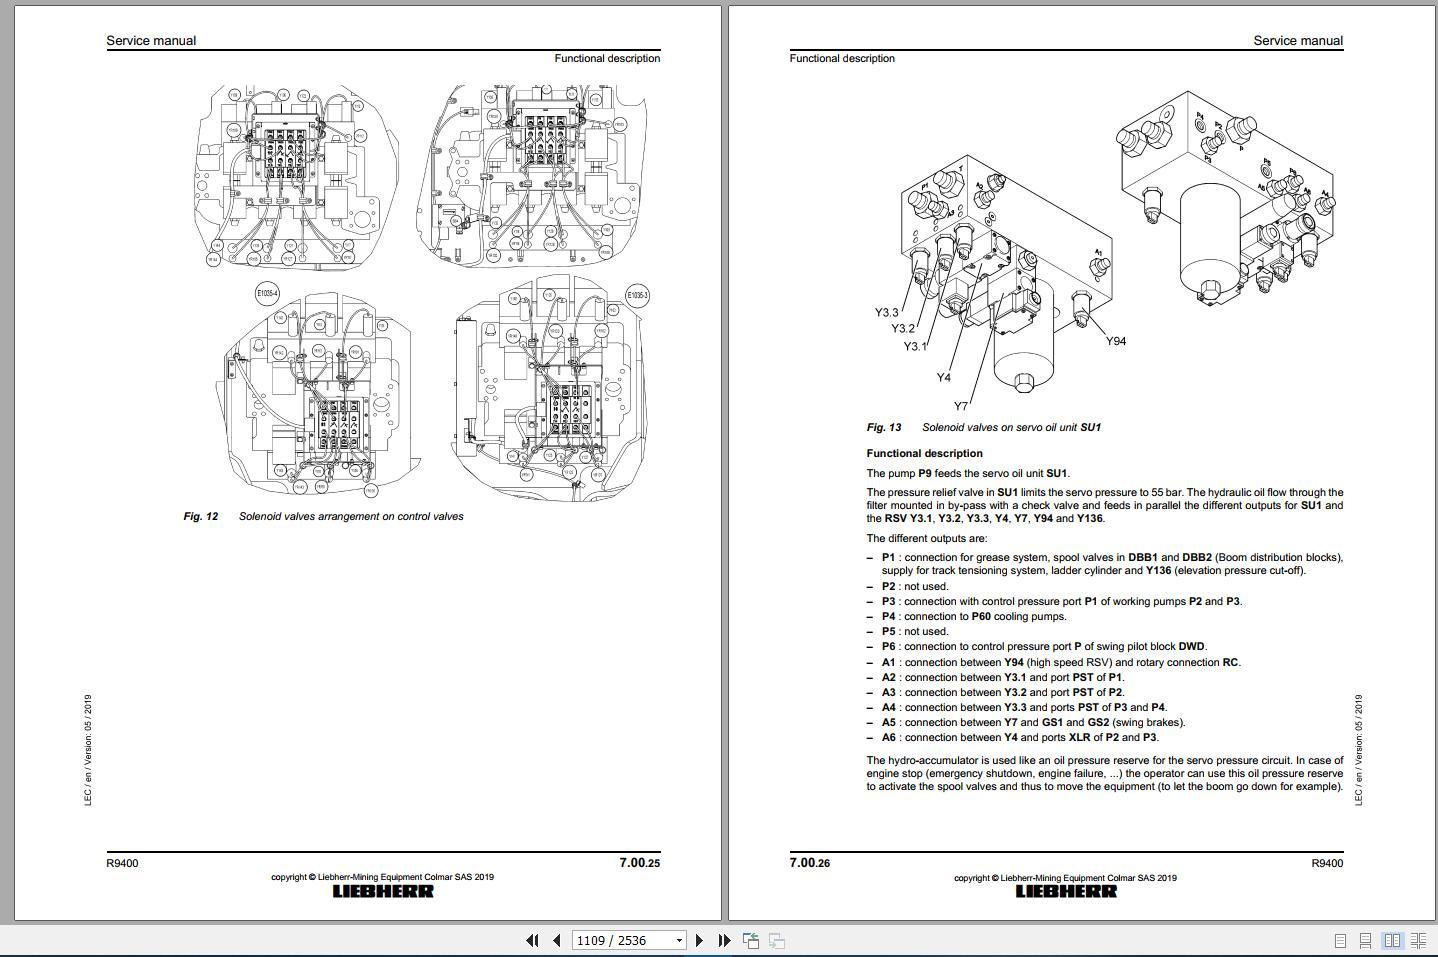 Liebherr_Mining_Excavators_Service_Manual_New_Updated_032020_27